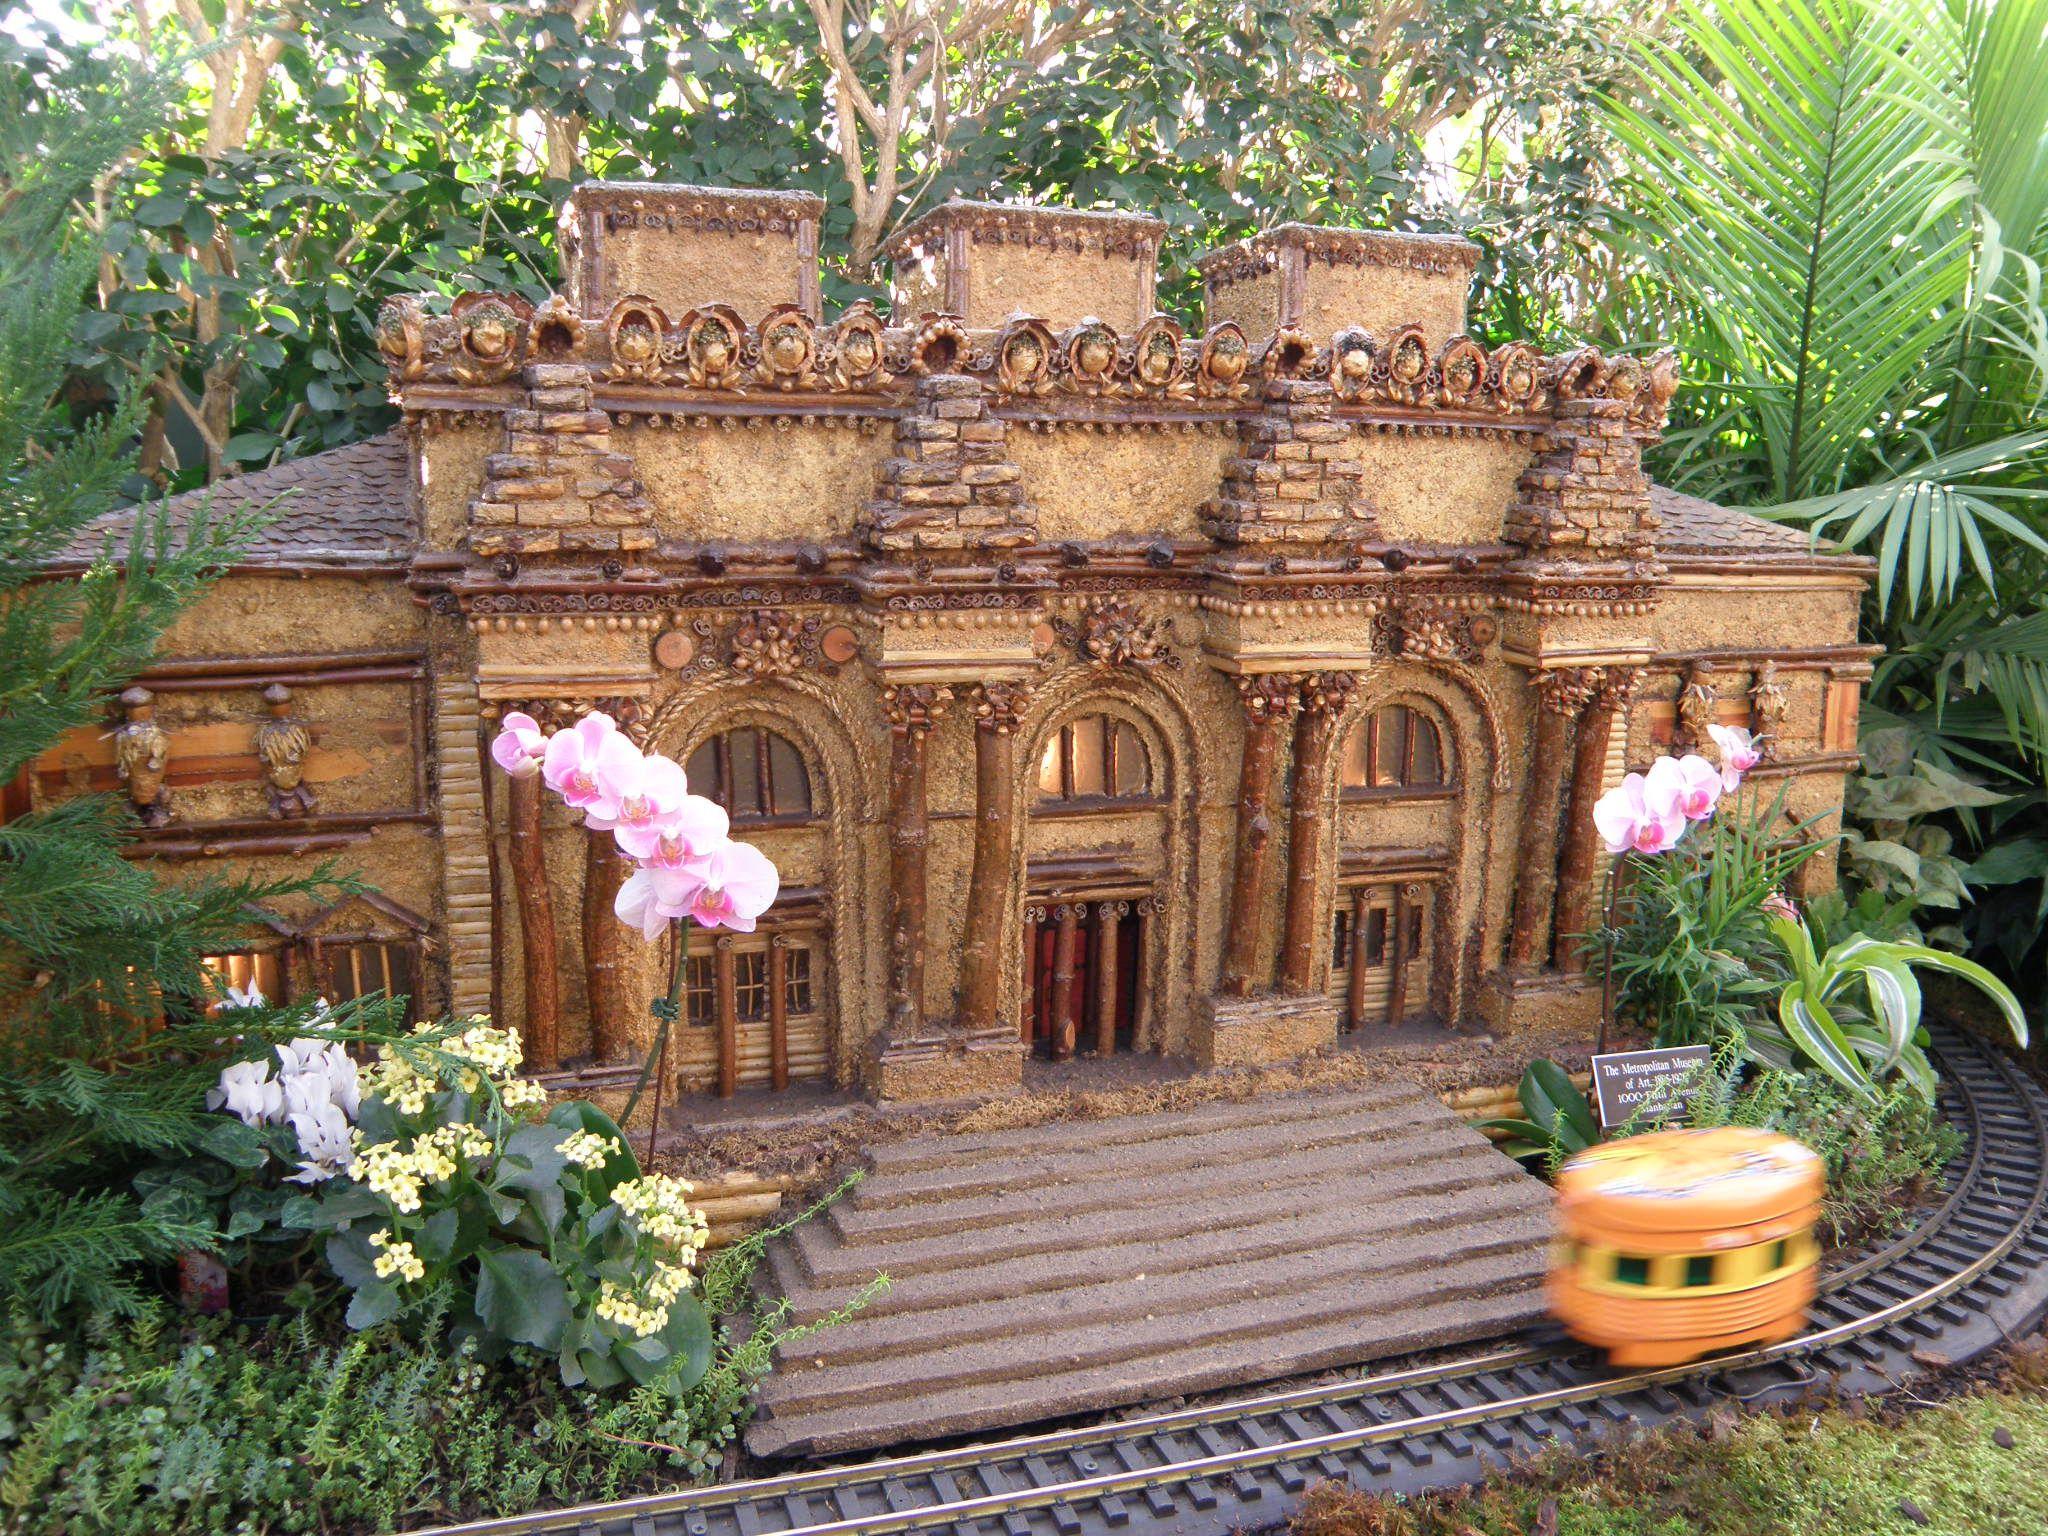 3e3f8d6b488ccb081d9b41e53f745564 - Holiday Train Show Ny Botanical Gardens